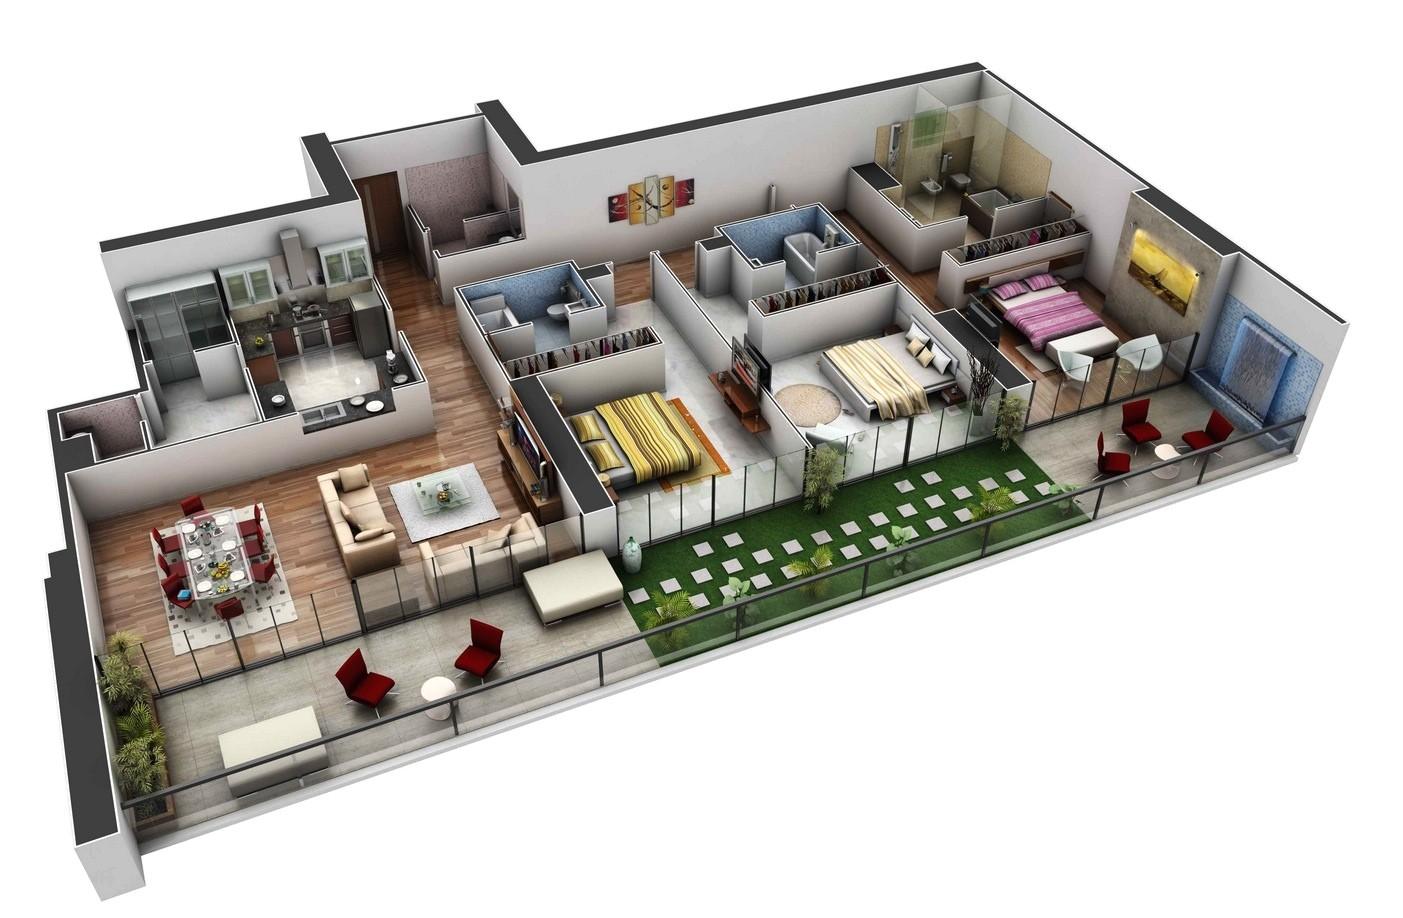 Spacious 3 Bedroom House Plans Spacious 3 Bedroom House Plans Interior Design Ideas